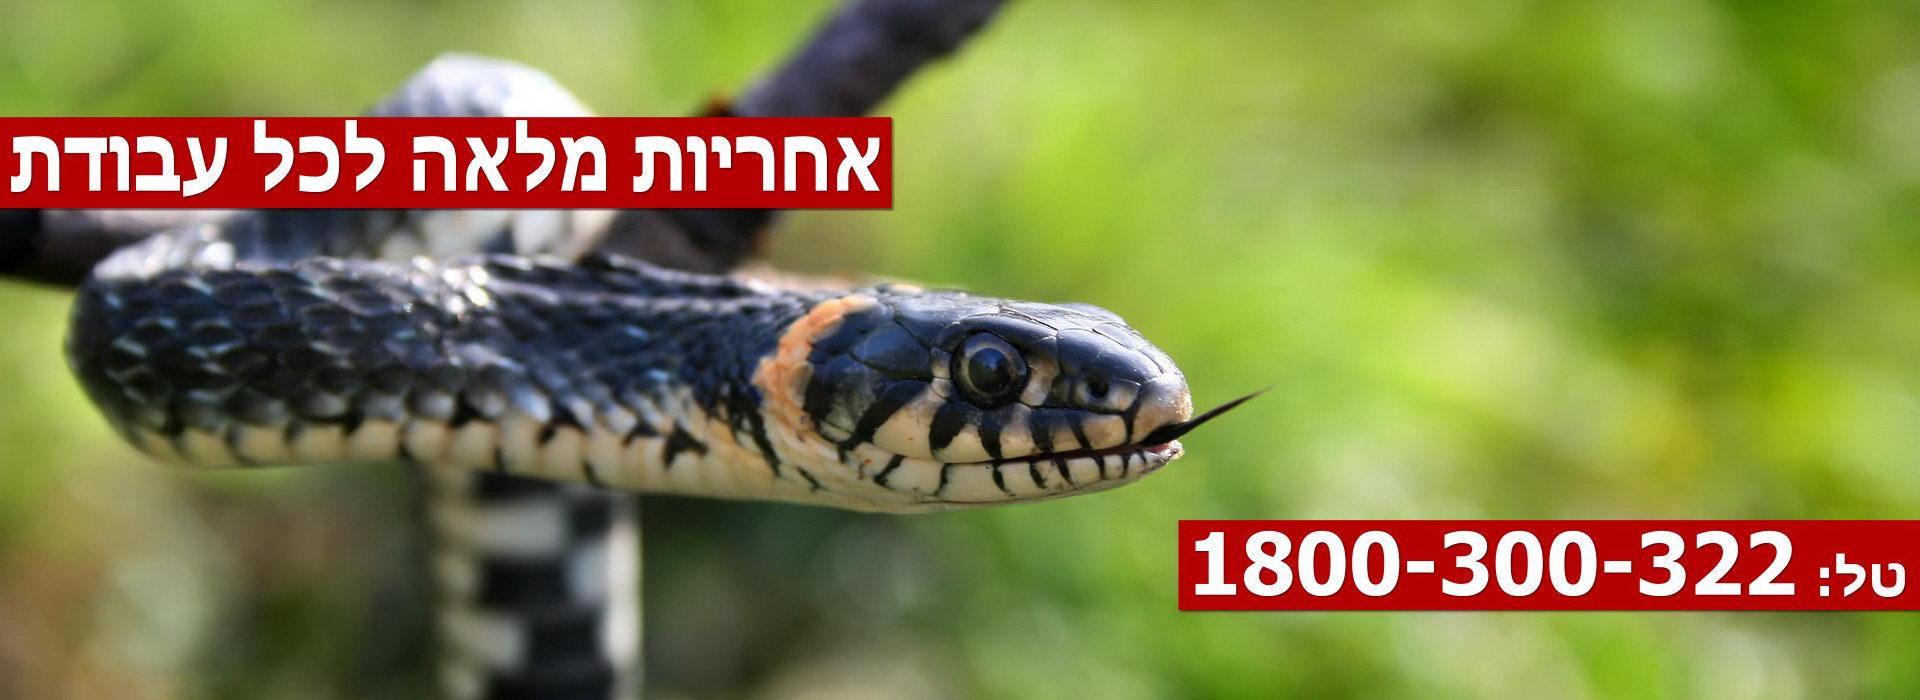 Pest-Control-Haifa-Slider5